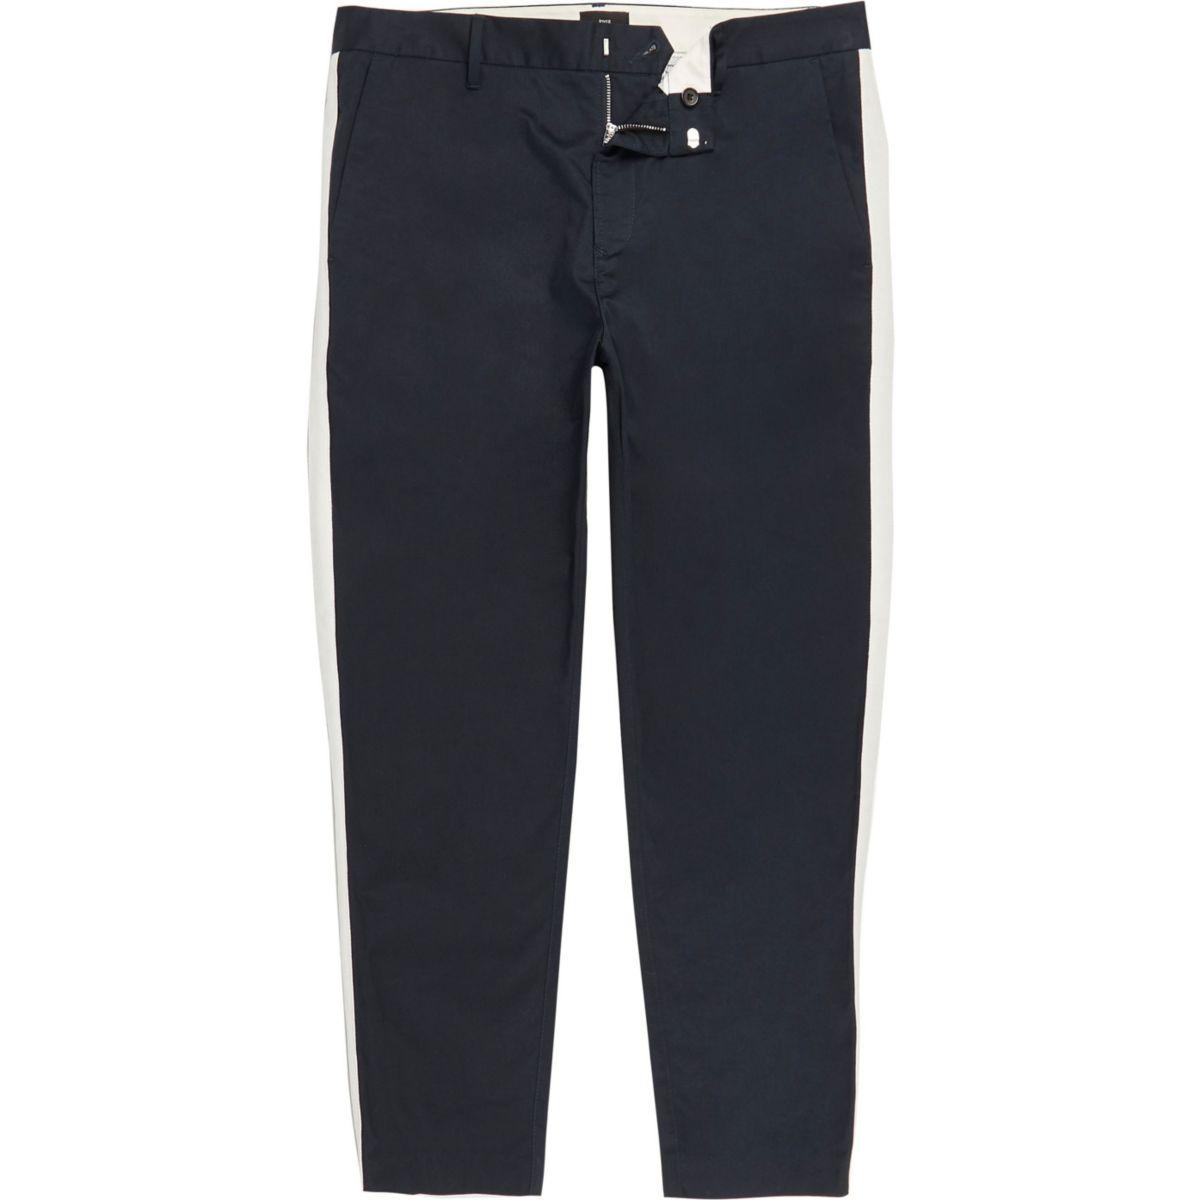 Big & Tall navy skinny taped pants